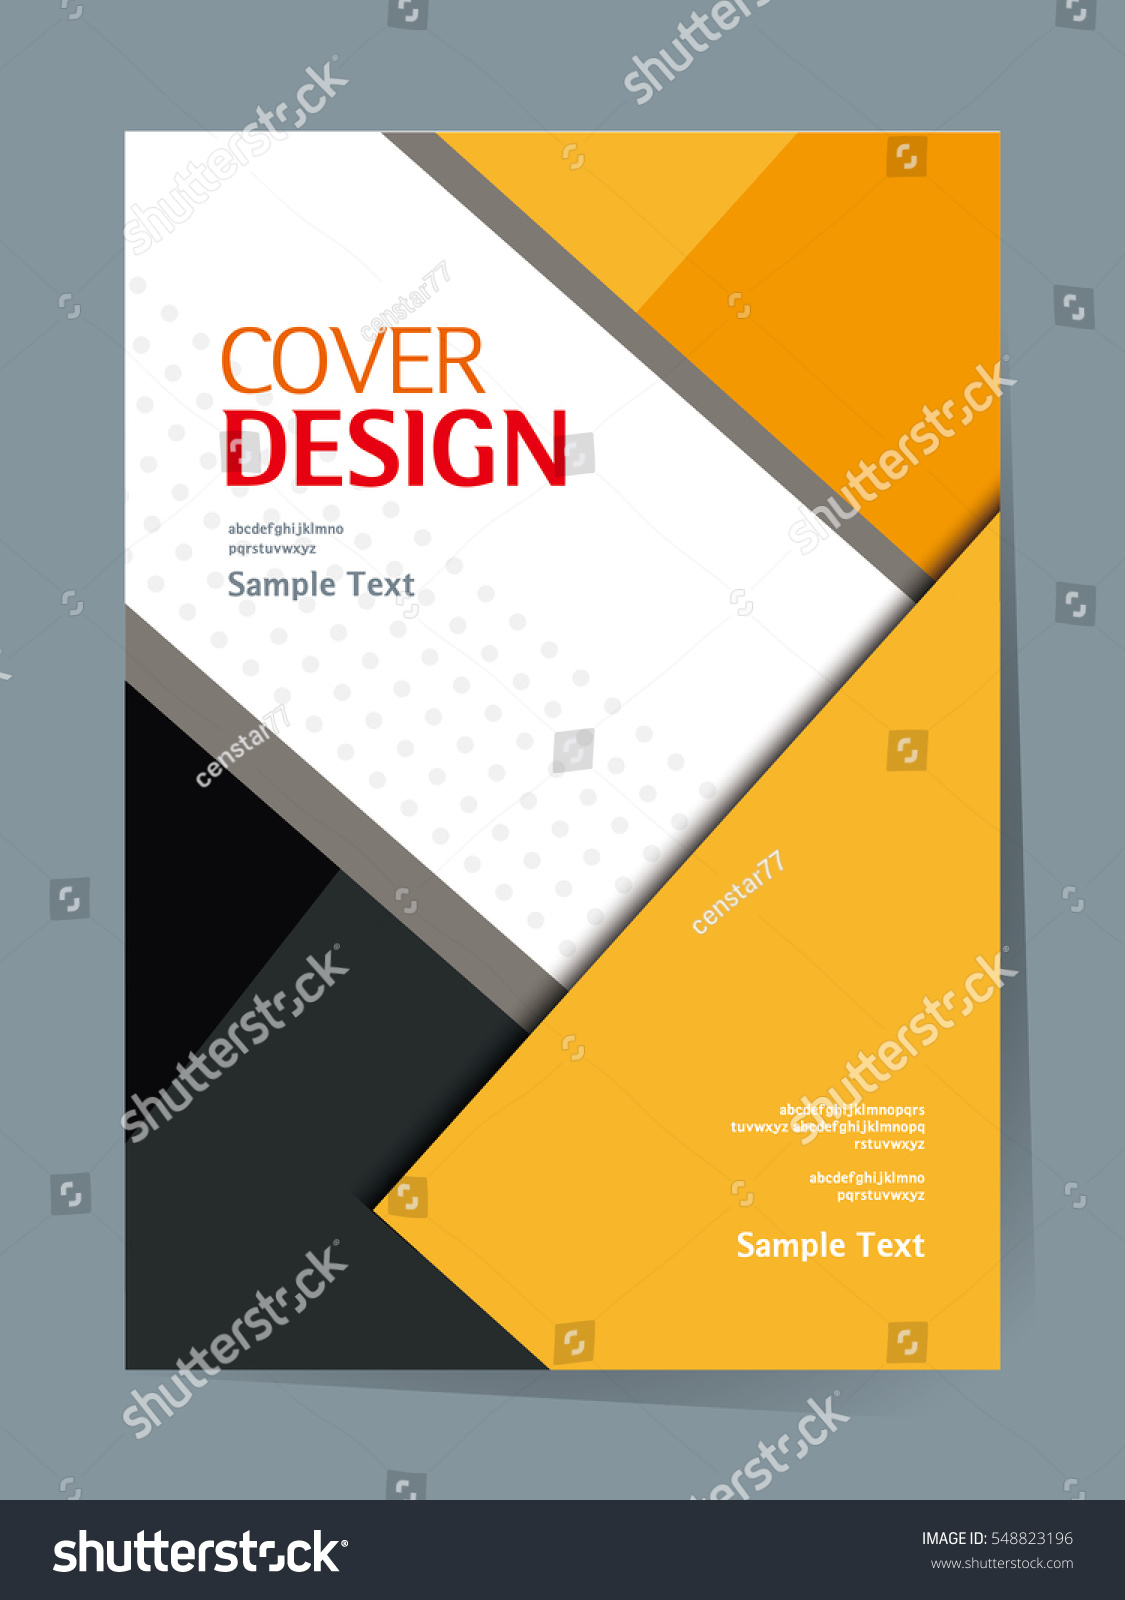 Cookbook Cover Vector : Book cover design vector template a stock